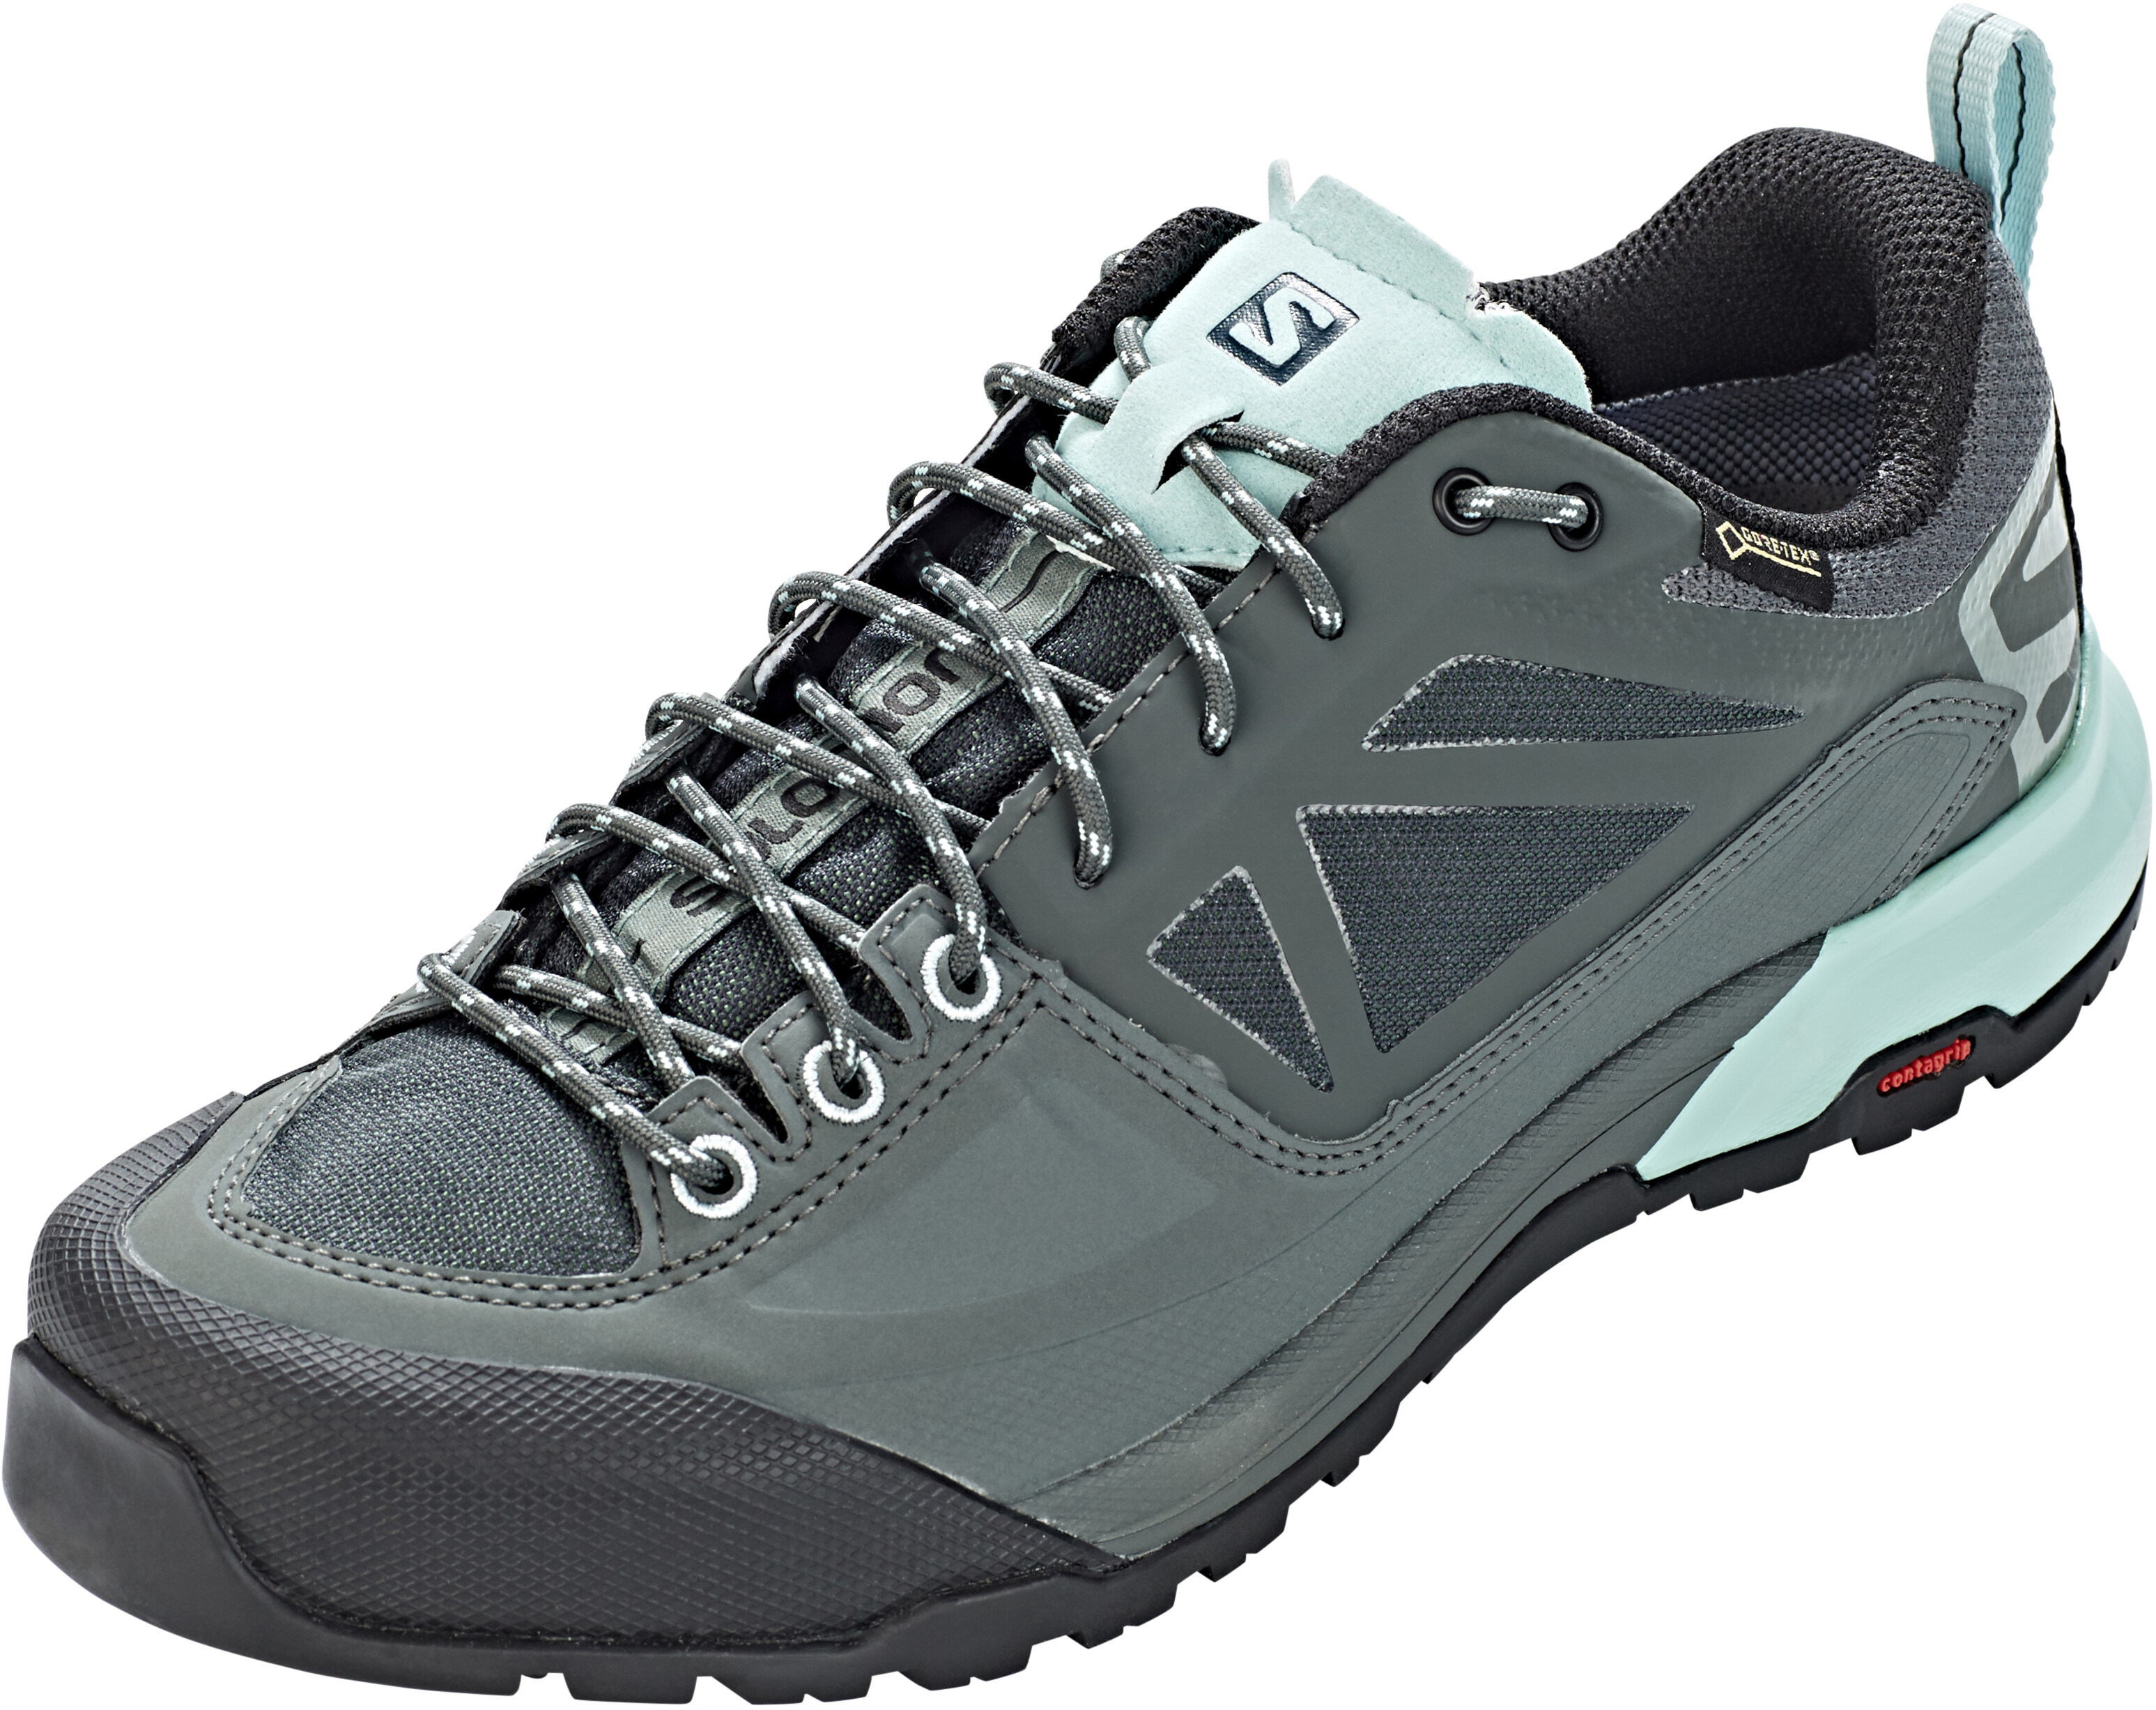 0b6598d027dc6 Salomon X Alp SPRY GTX Shoes Women balsam green/urban chic/canal blue